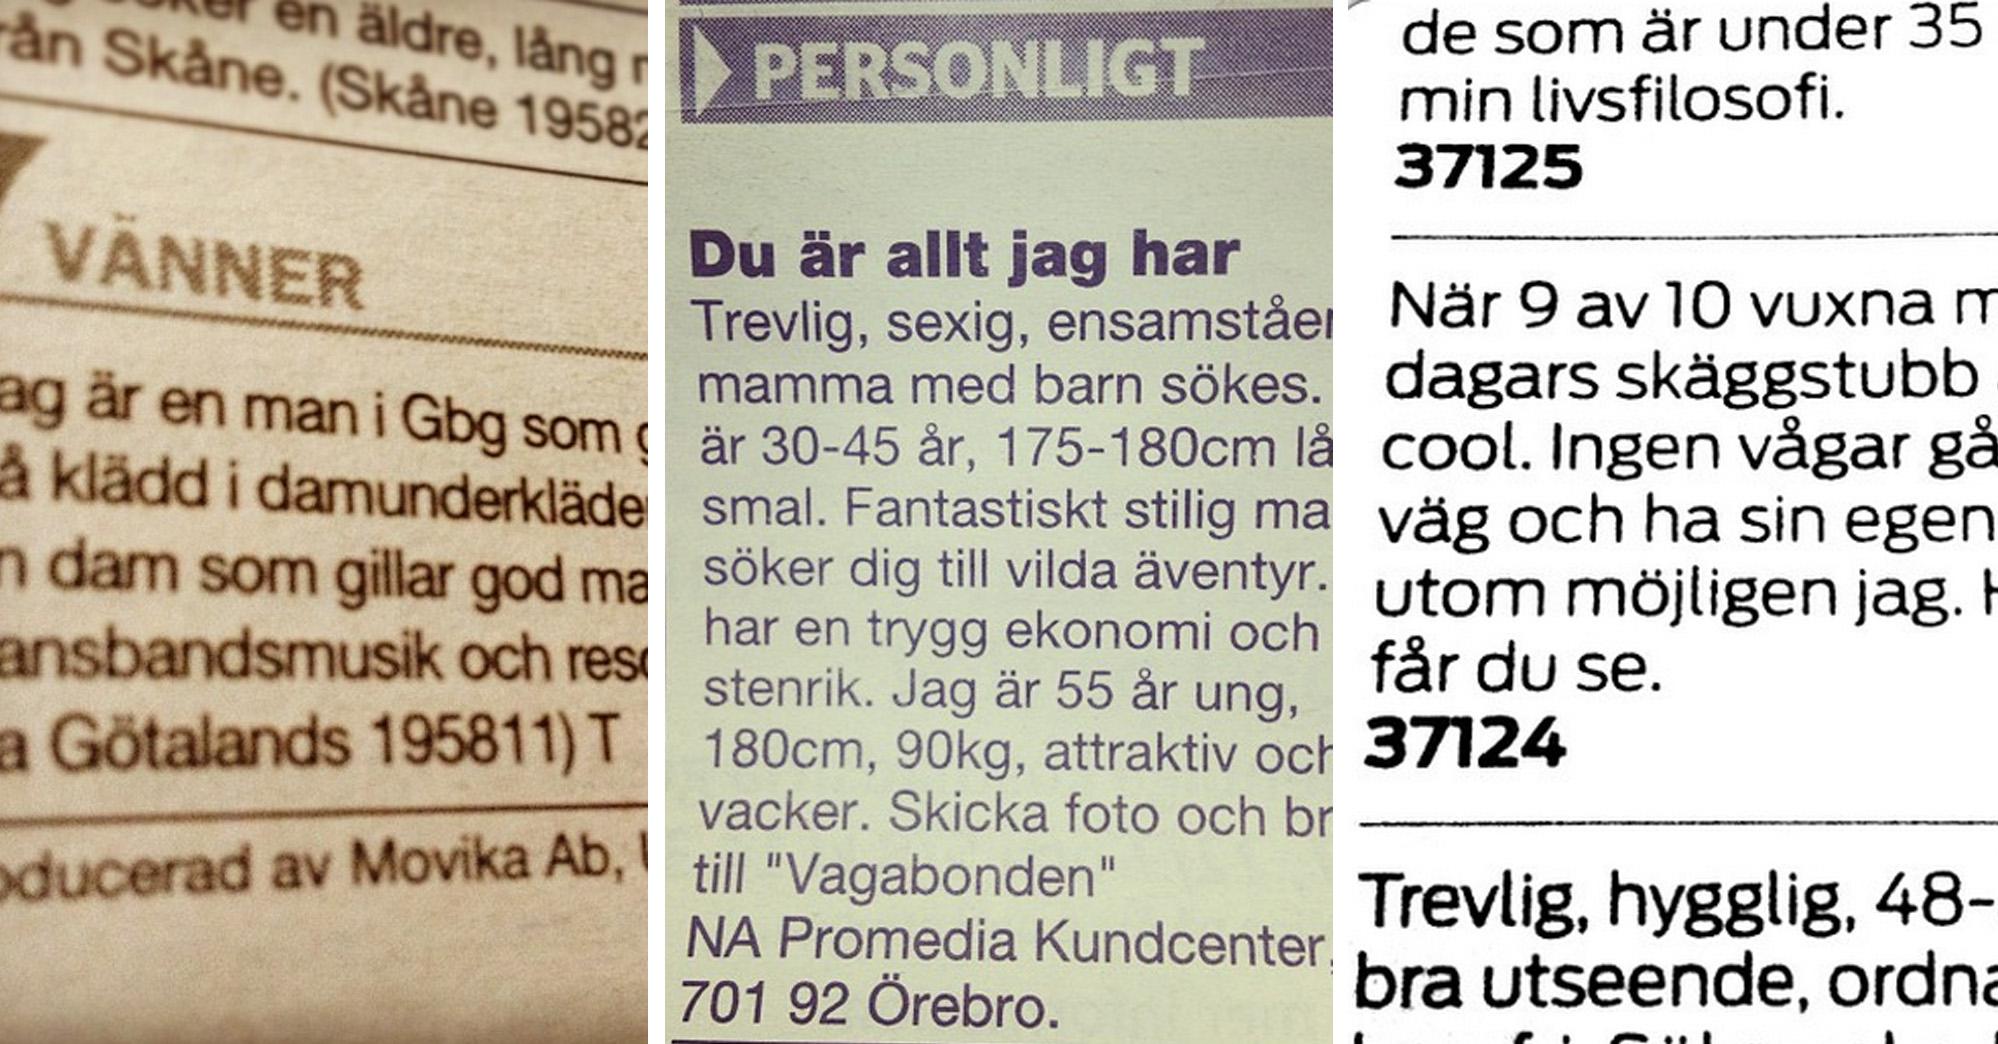 kontaktannonser roliga Tromsø